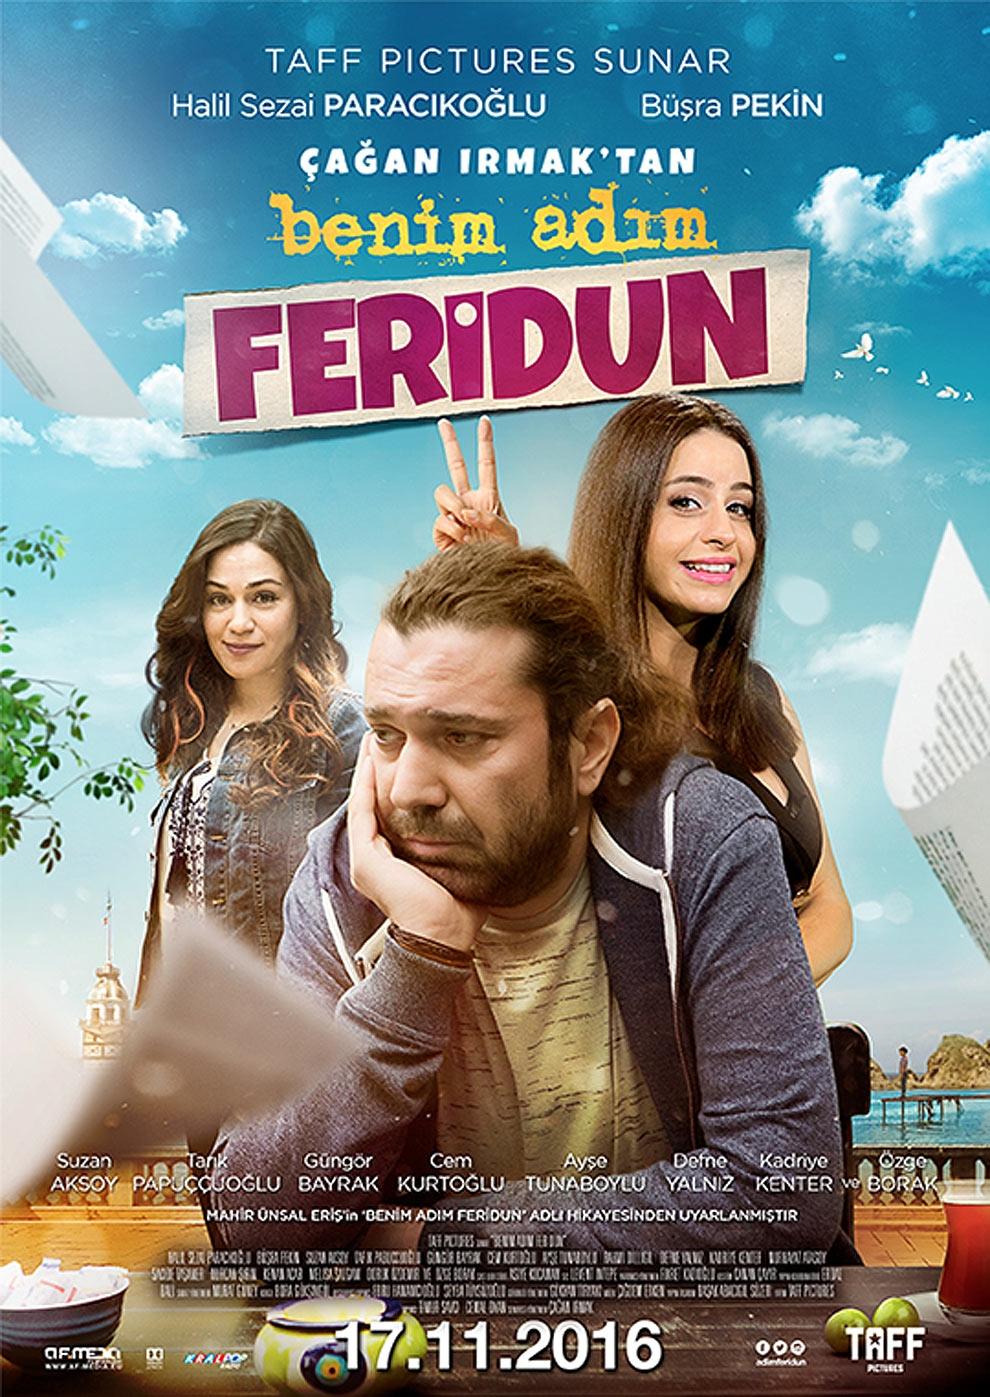 Benim Adim Feridun - Mein Name ist Feridun (Poster)